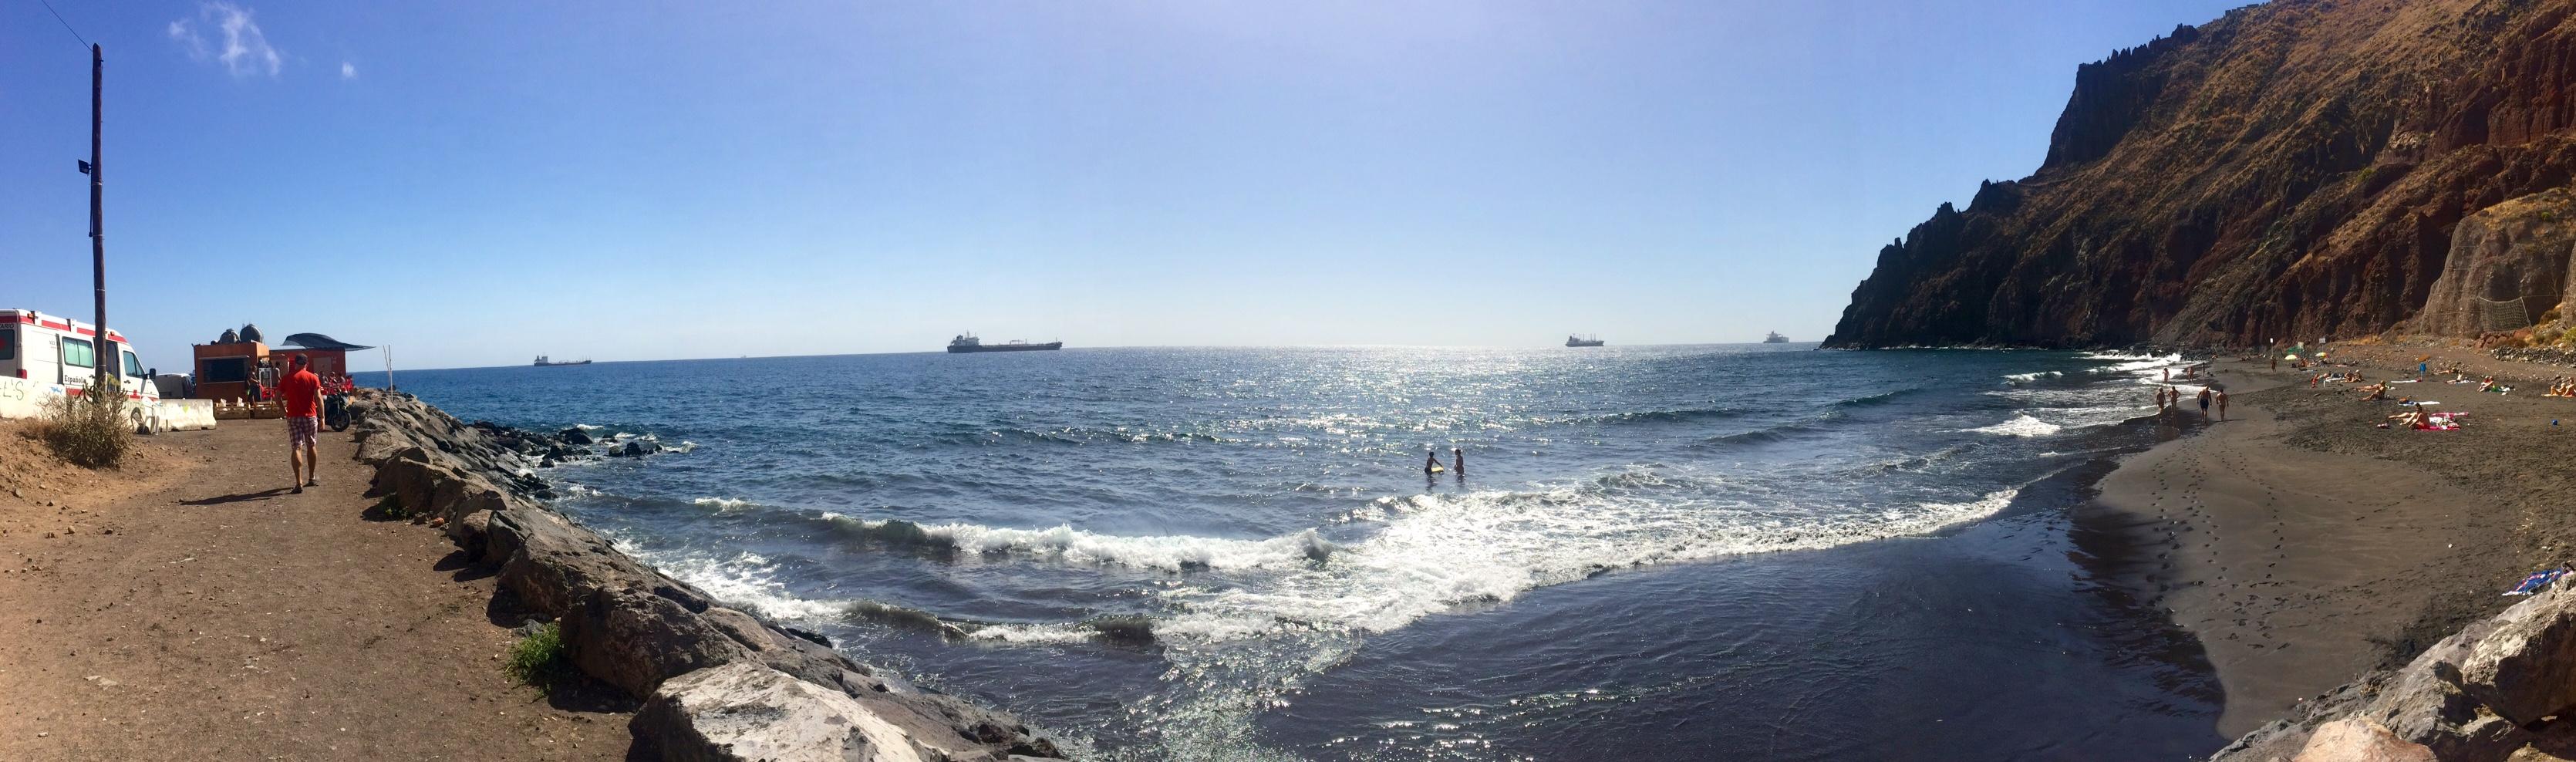 Playa Las Gaviotas